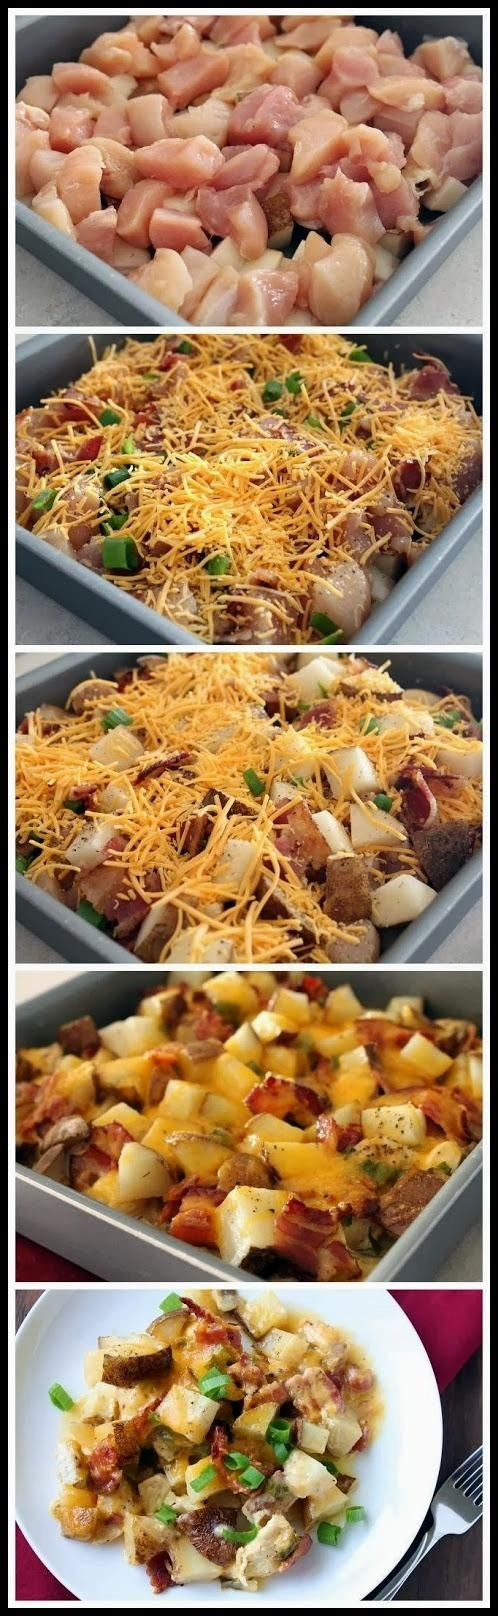 Loaded Baked Potato & Chicken Casserole - Joybx